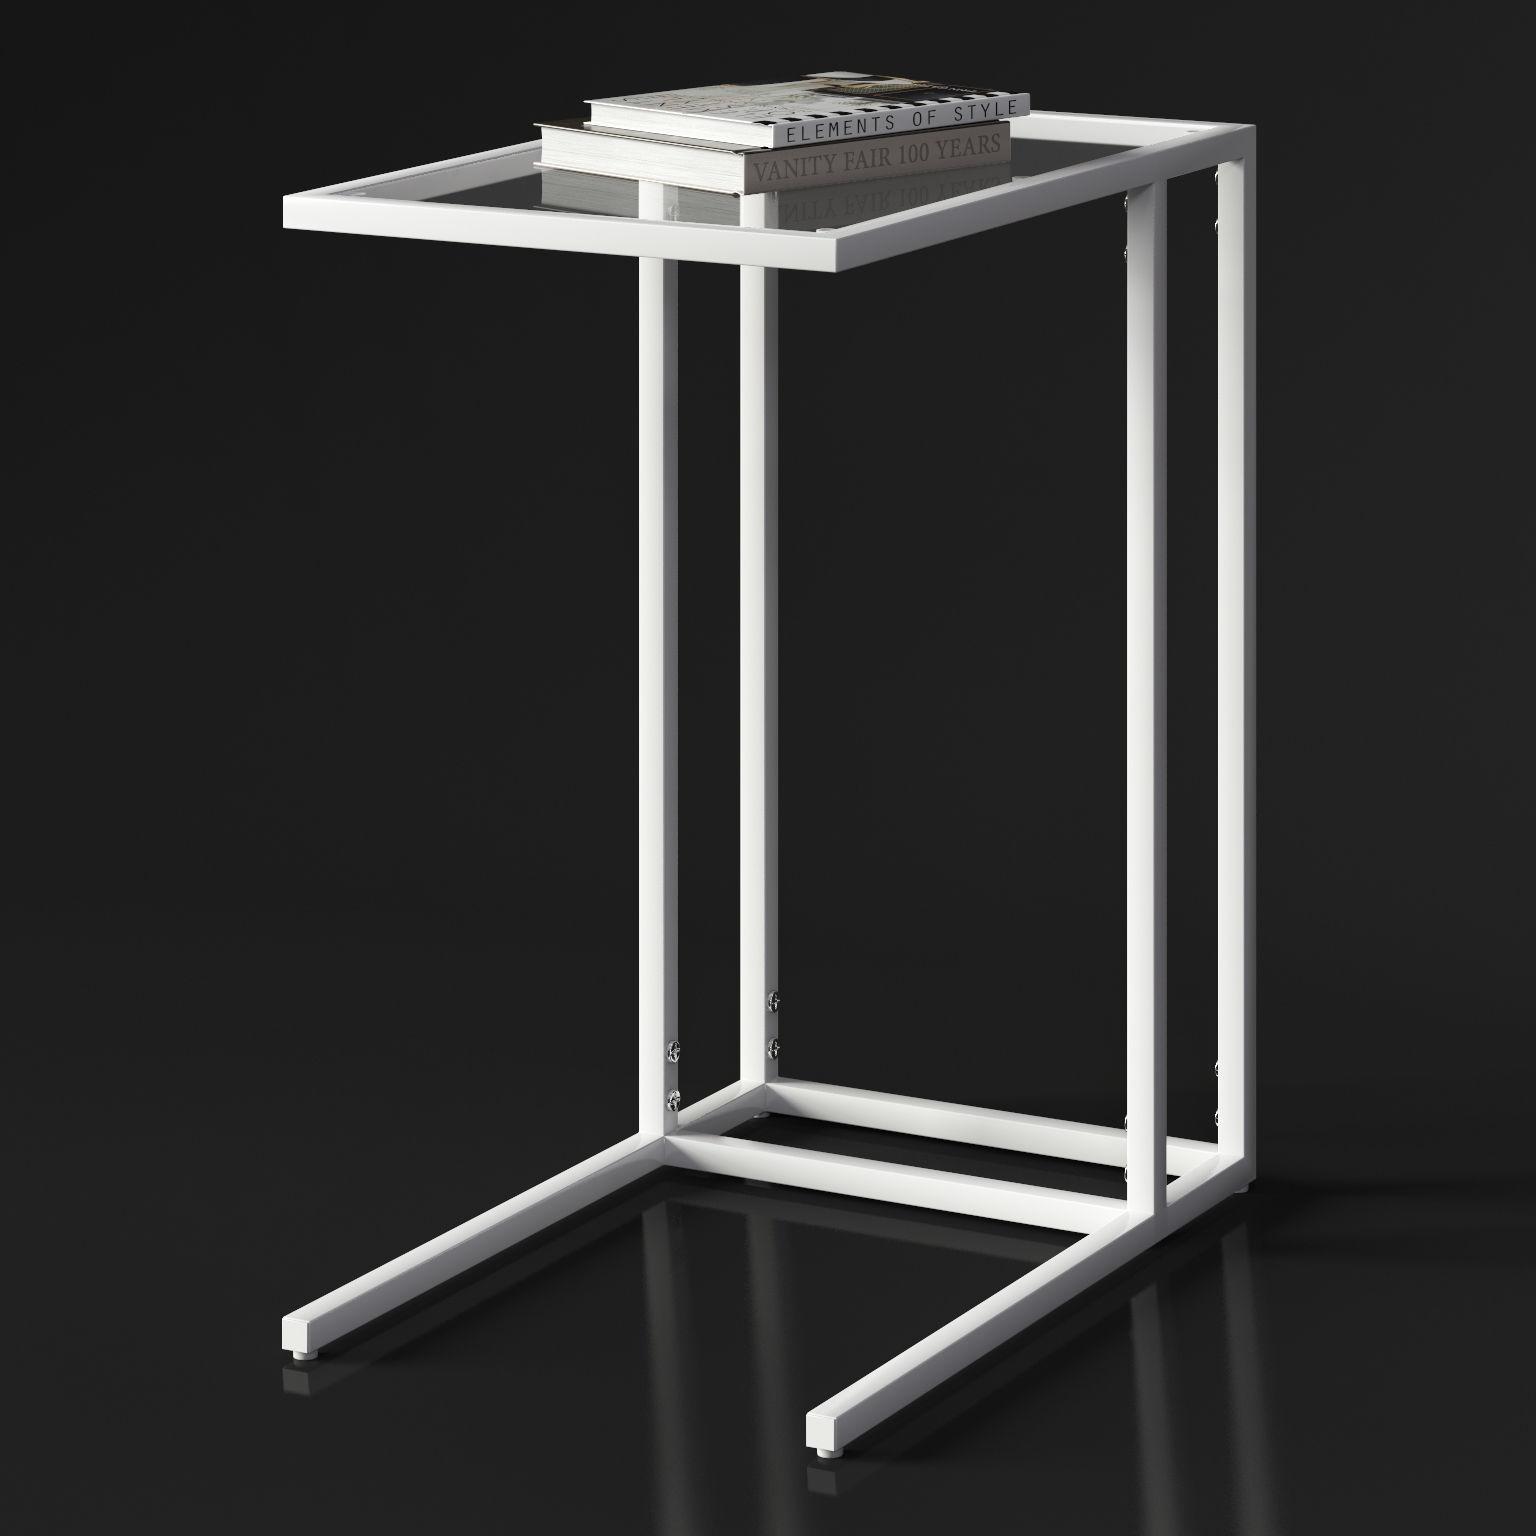 Ikea Vittsjo Laptop Stand 3d Model Max Obj 3ds Fbx Mtl Mat 4